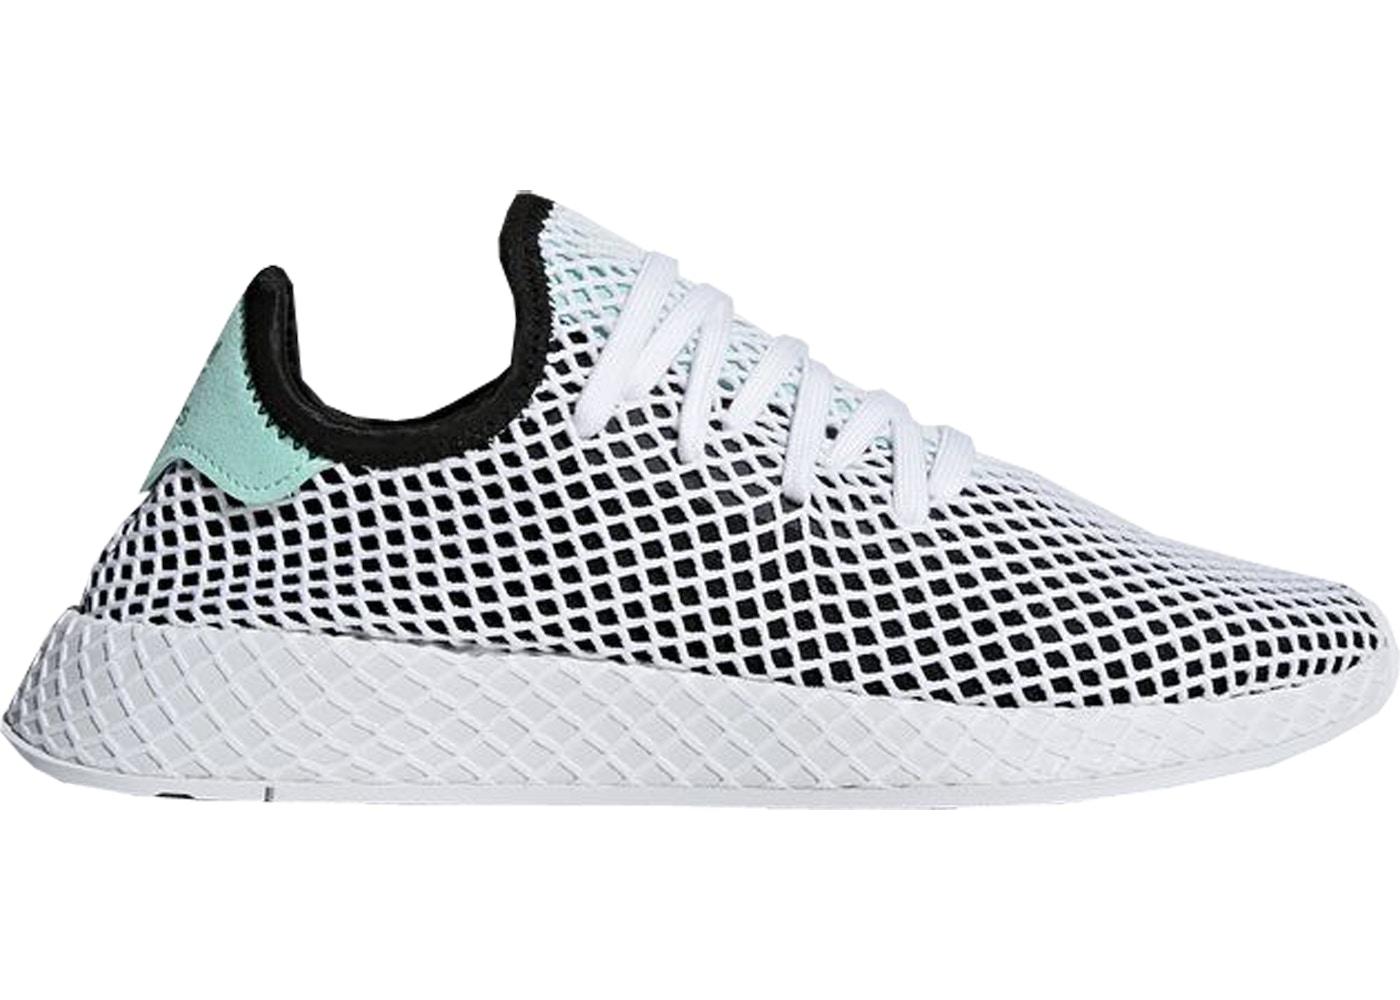 8a2af1bd207417 adidas Size 12 Shoes - Lowest Ask